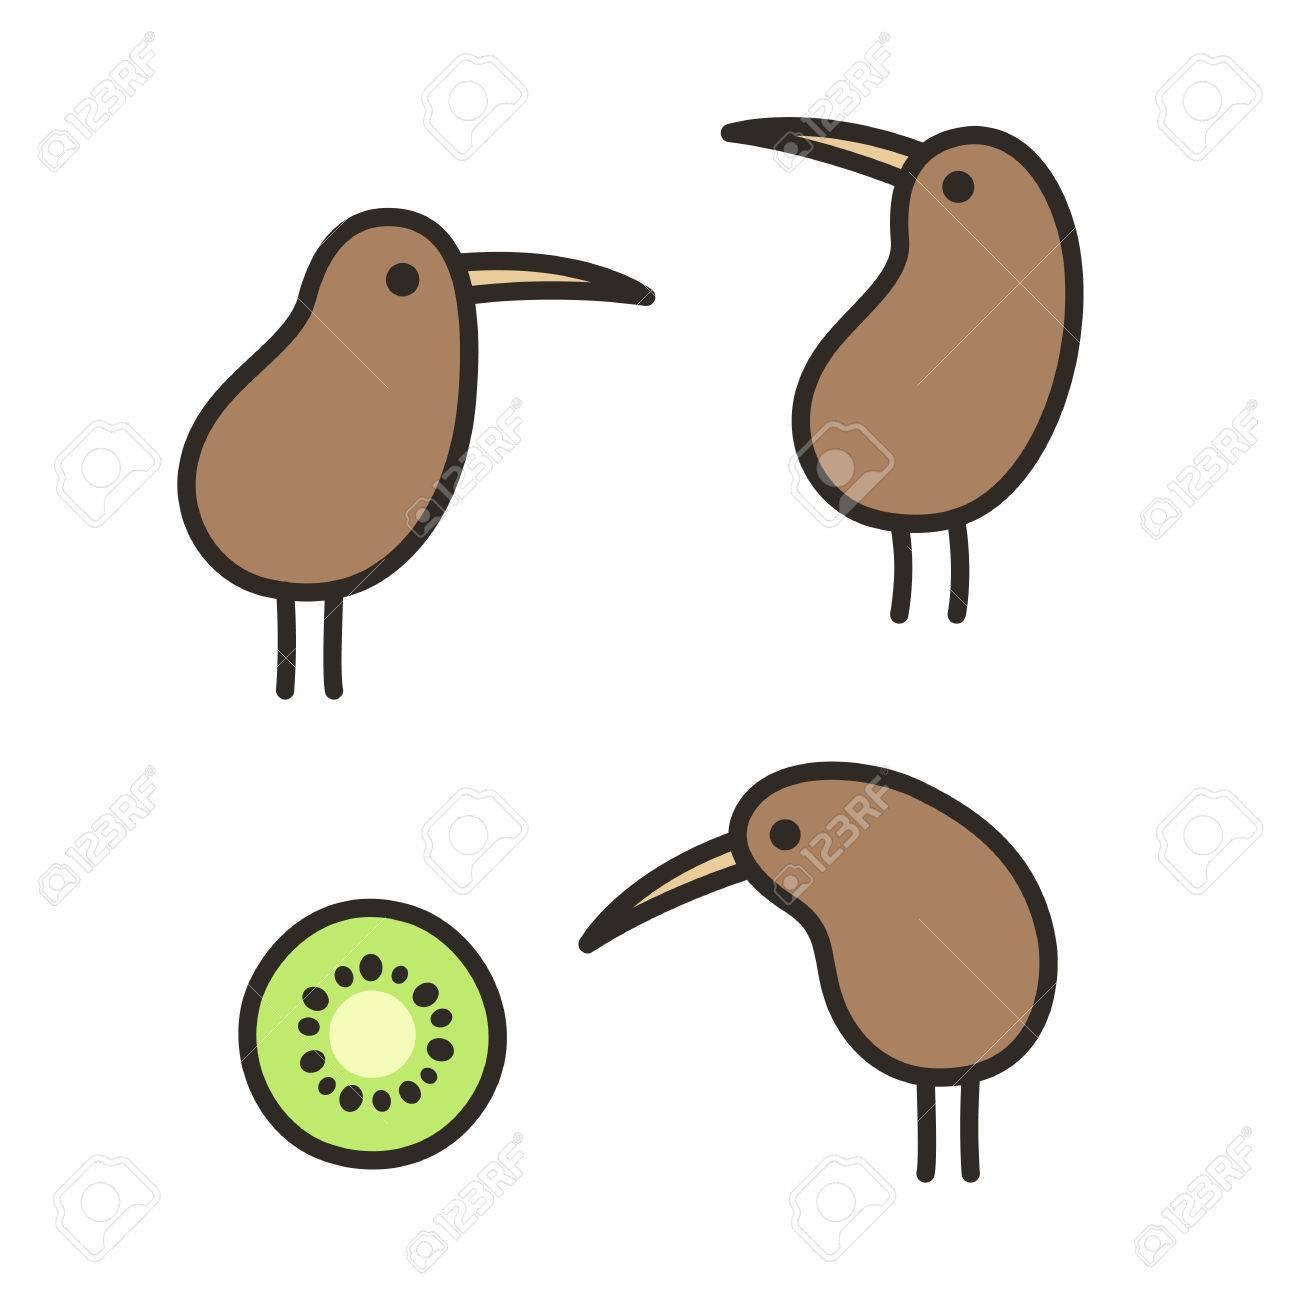 Set Of Doodle Kiwi Birds And Kiwi Fruit Simple And Cute Hand